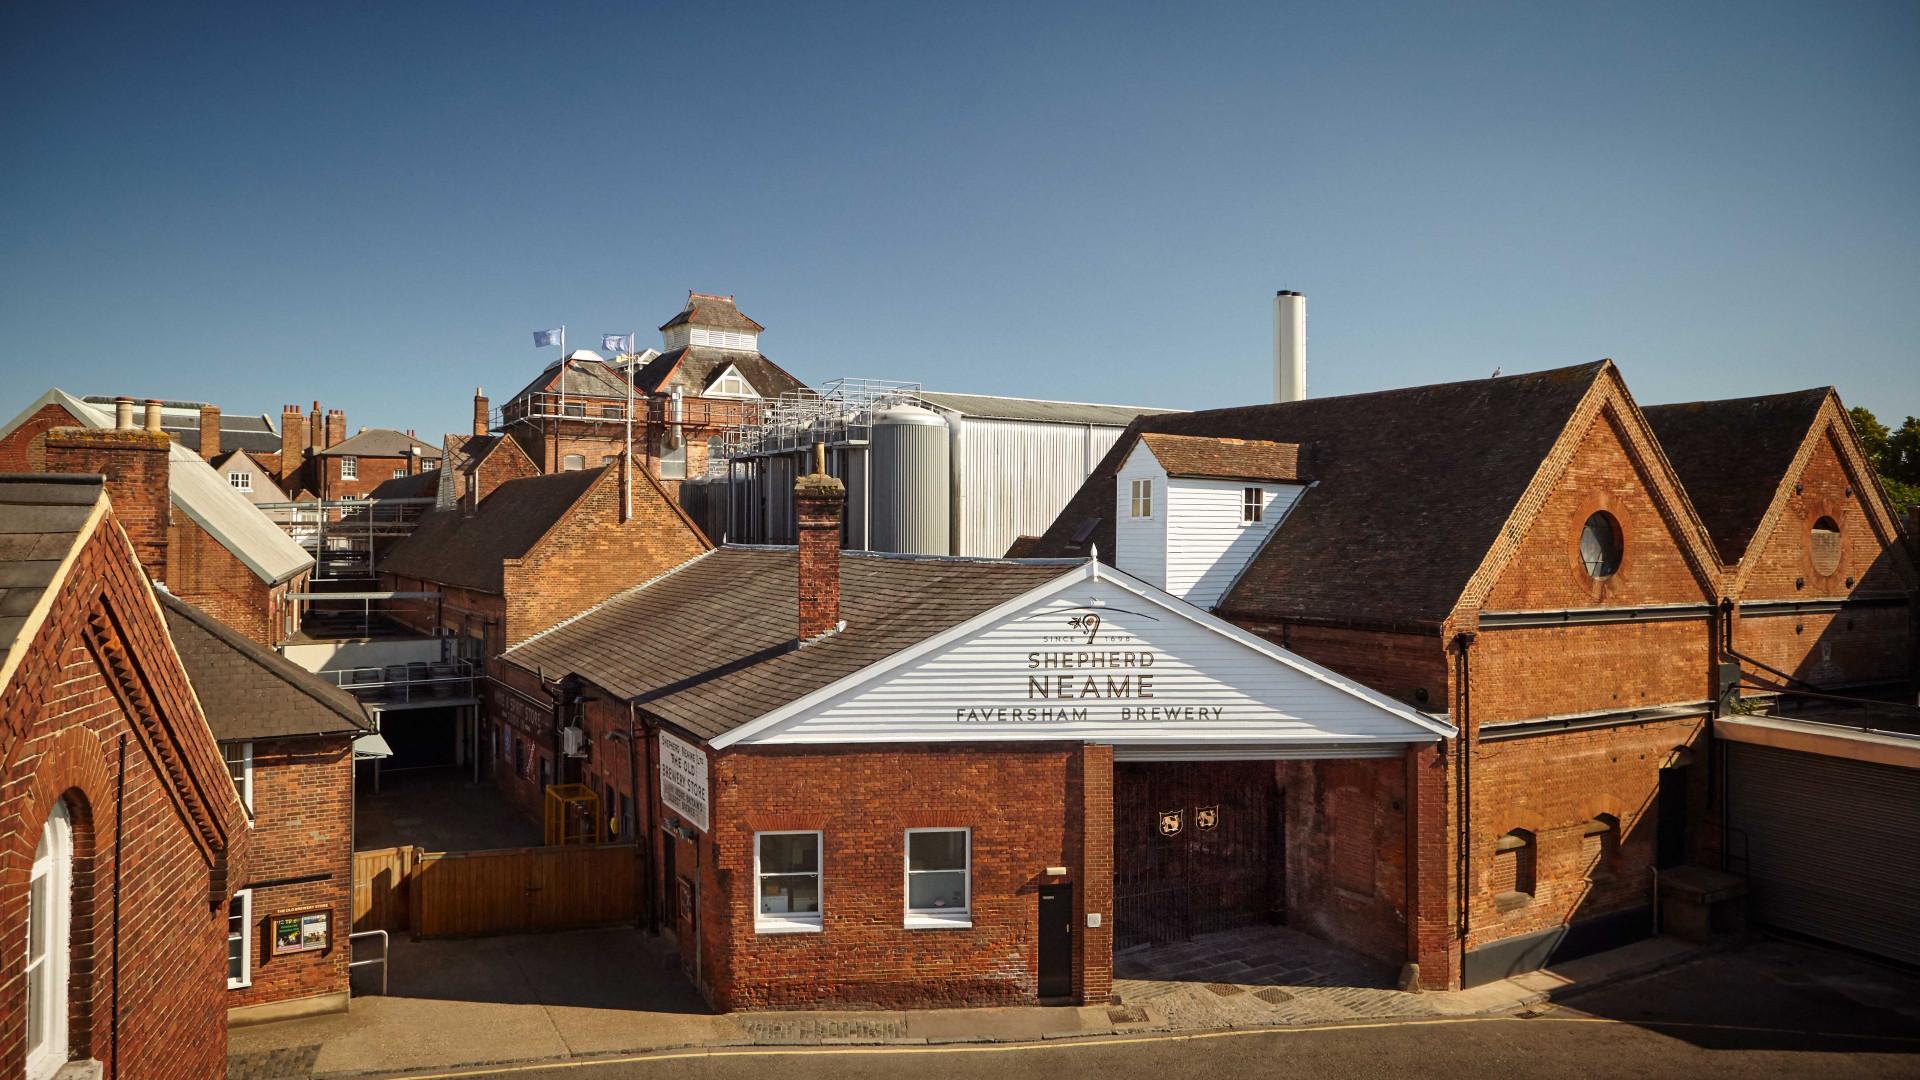 Shepherd Neame Brewery, Faversham